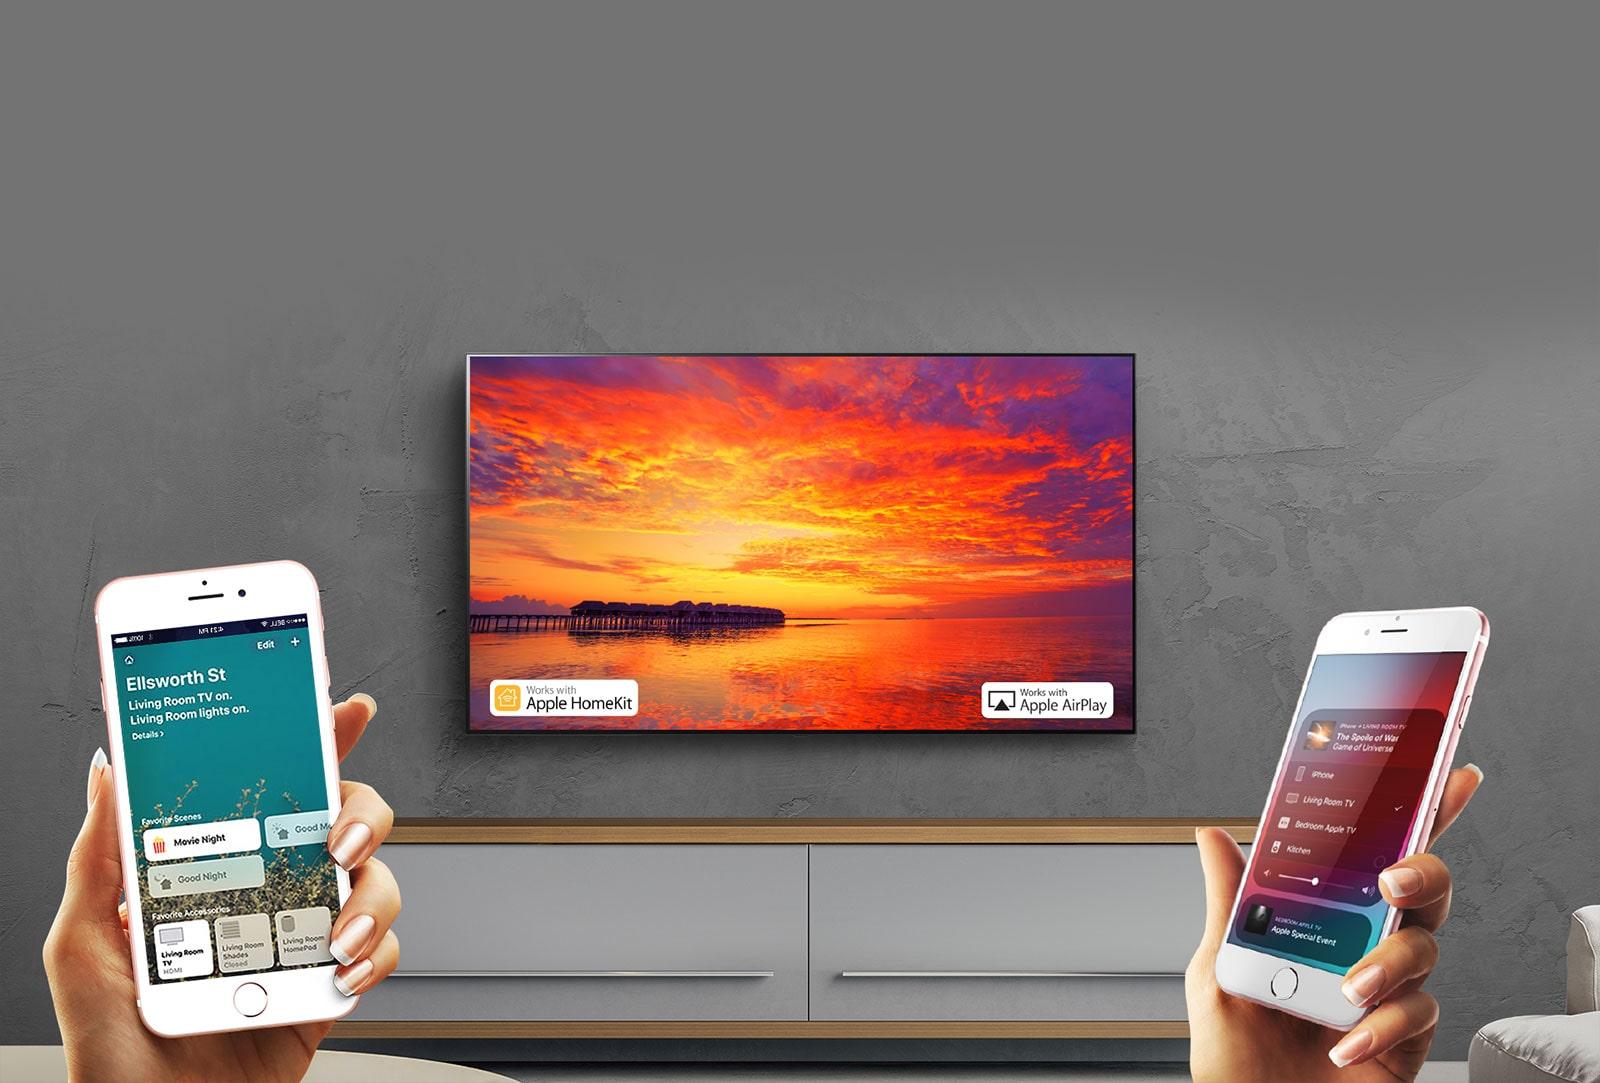 Apple Air Play 2